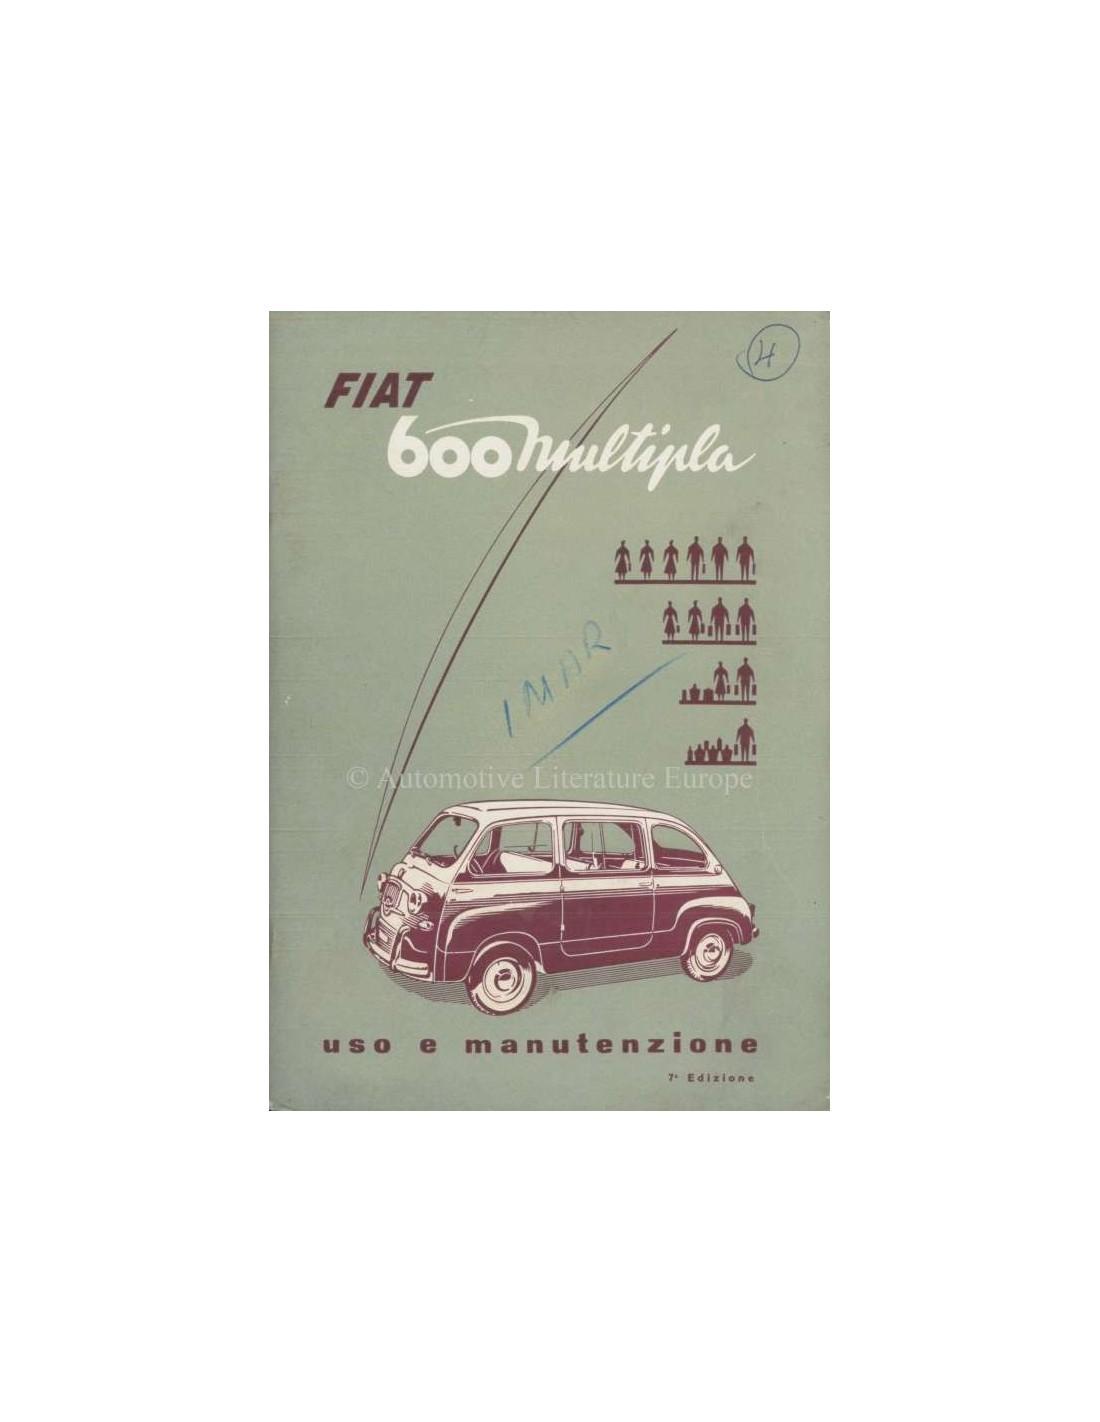 1959 fiat 600 multipla owners manual italian rh autolit eu Classic Fiat 500 Fiat 600 Abarth